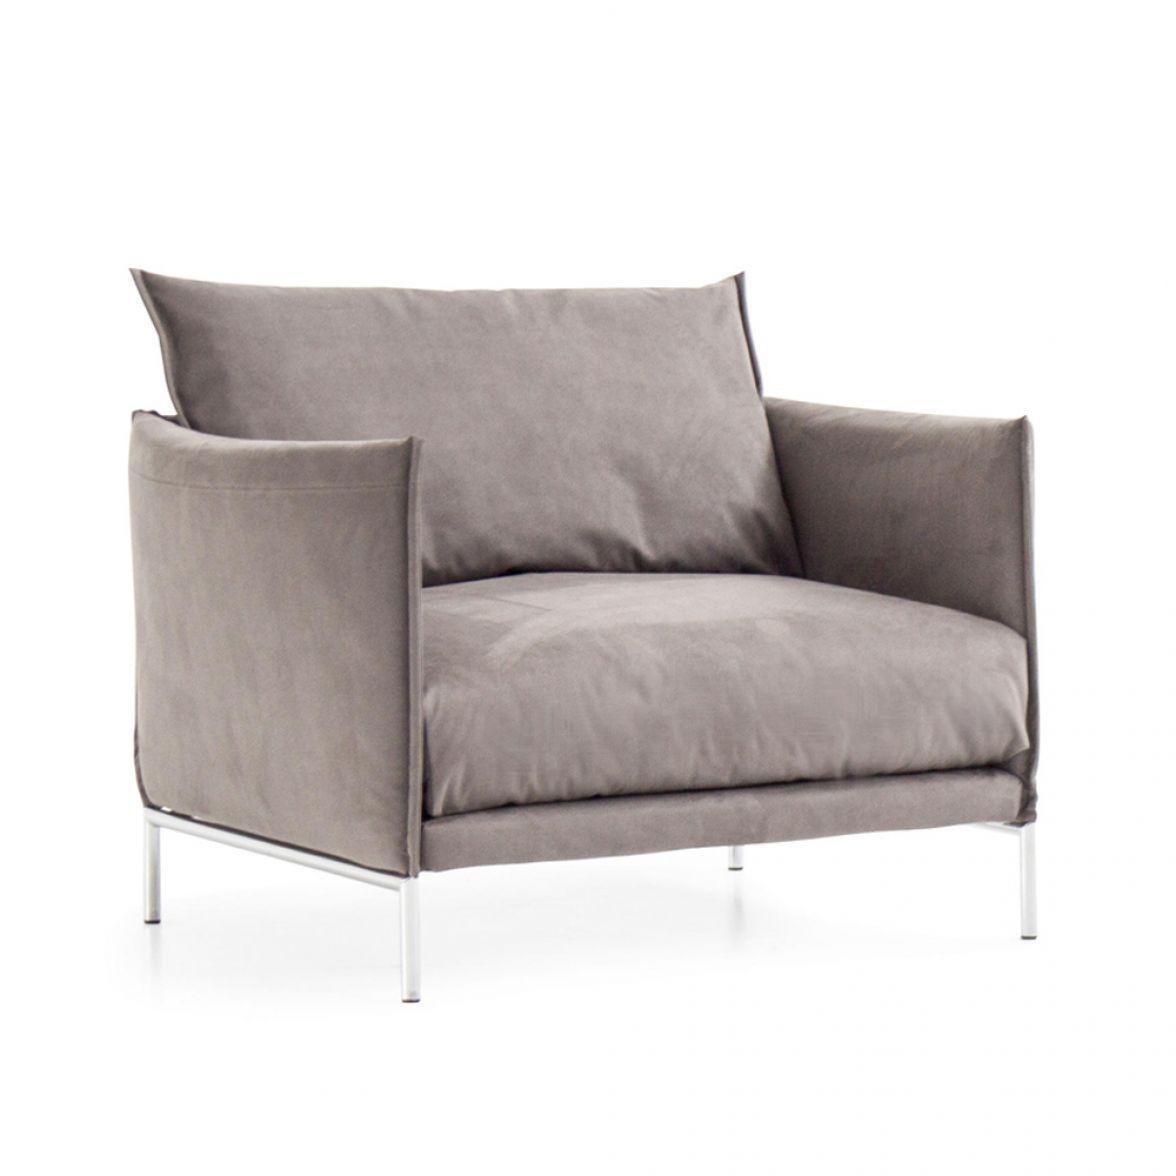 Gentry armchair фото цена